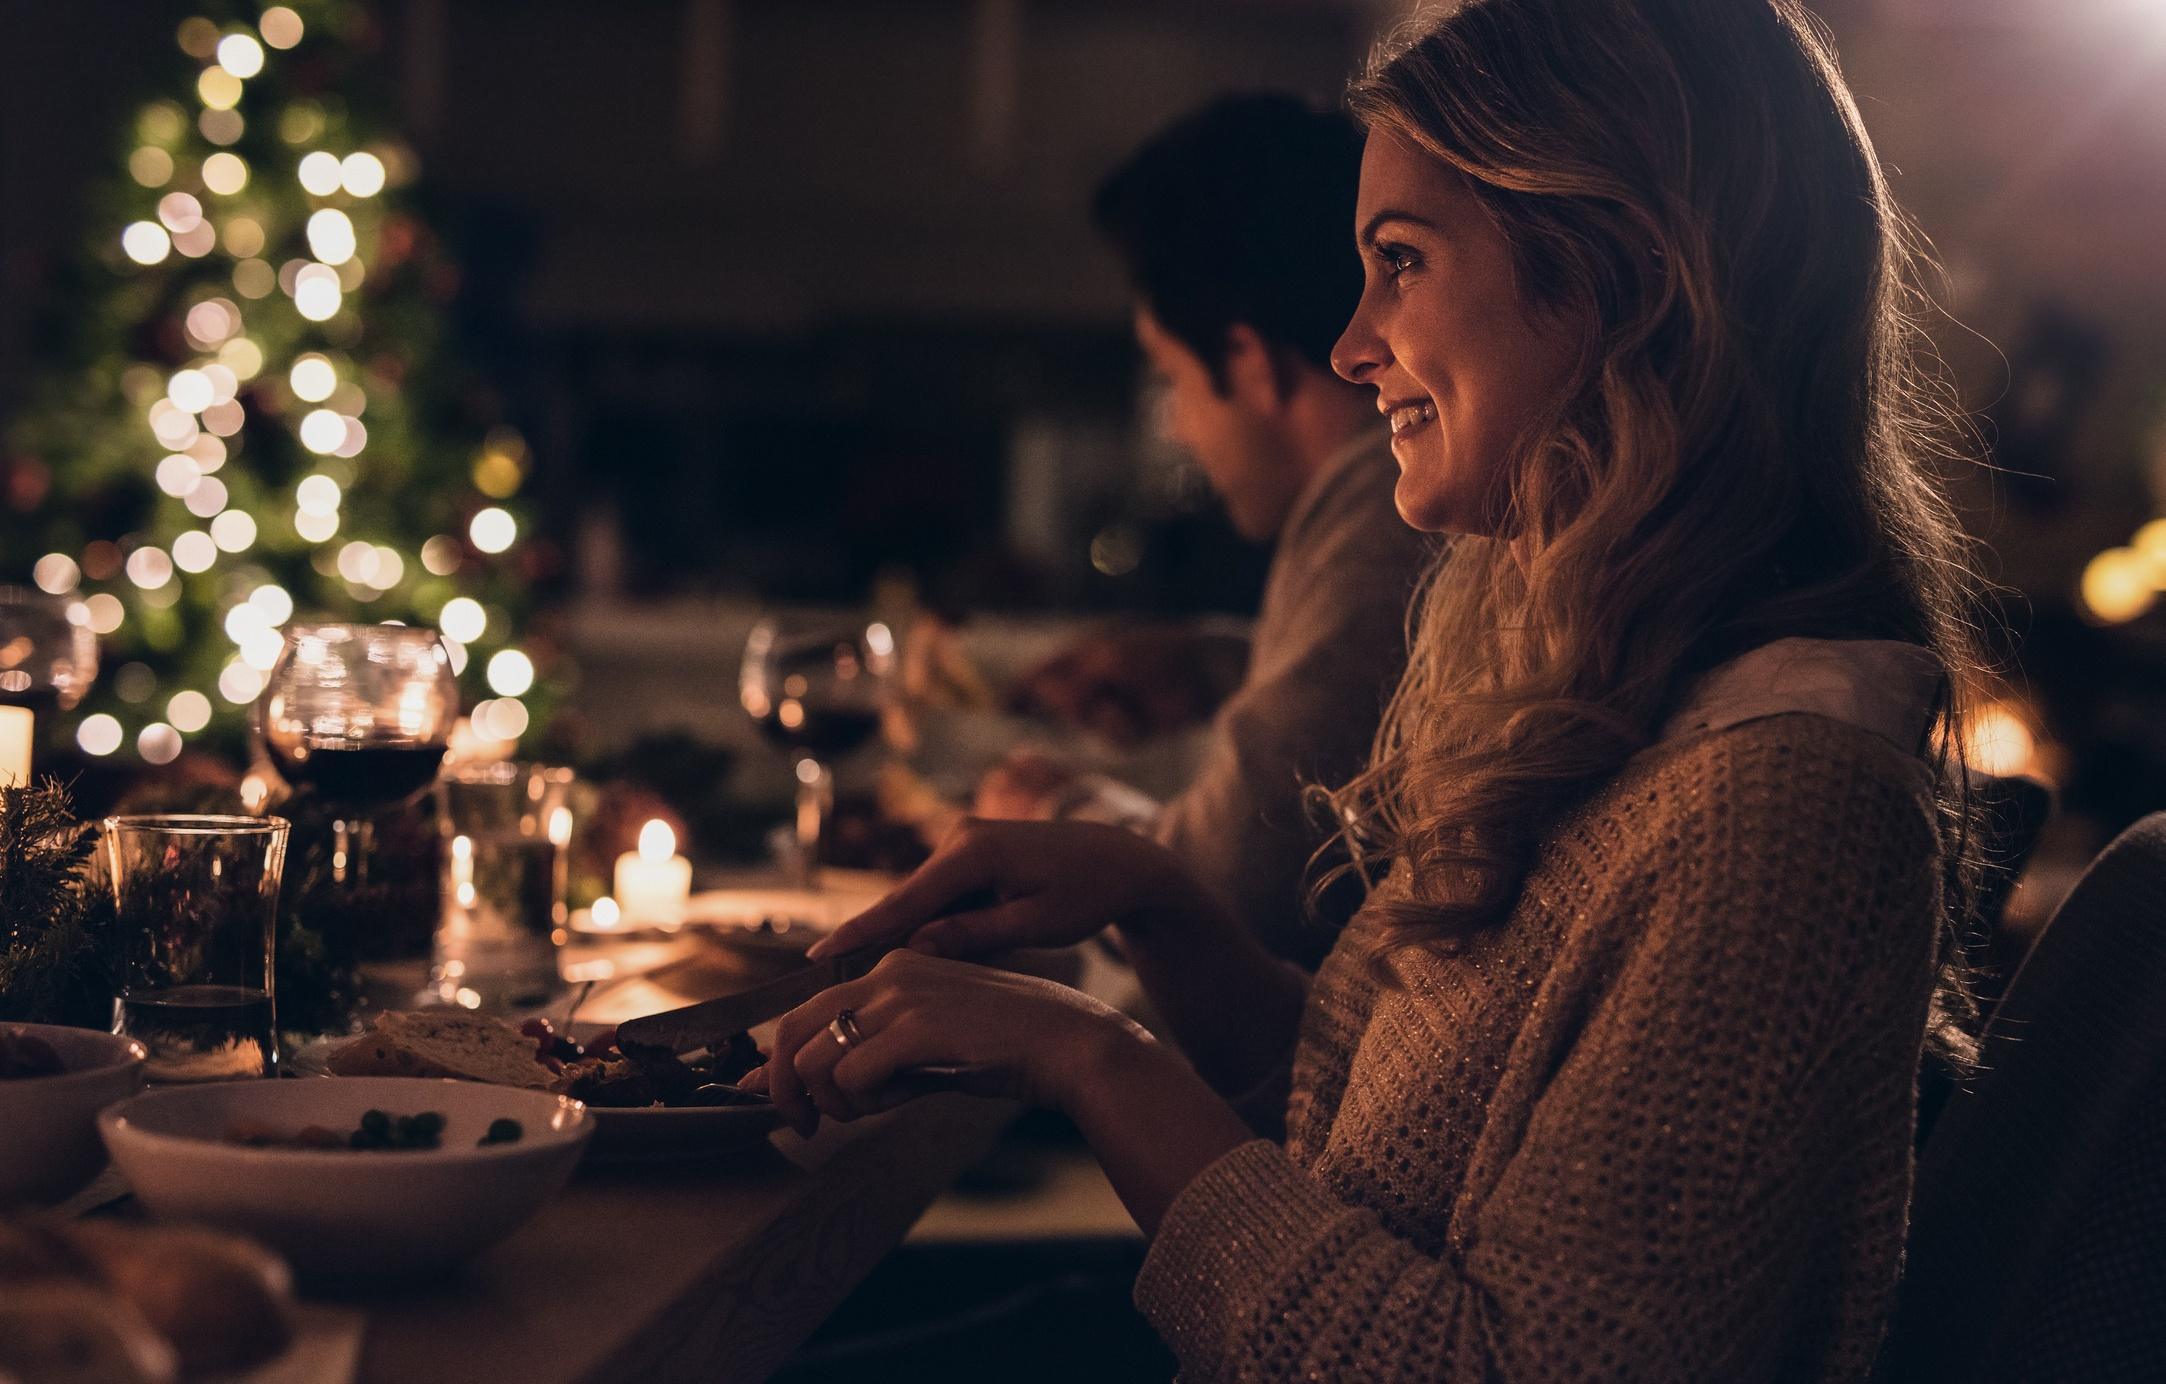 Woman at Christmas dinner